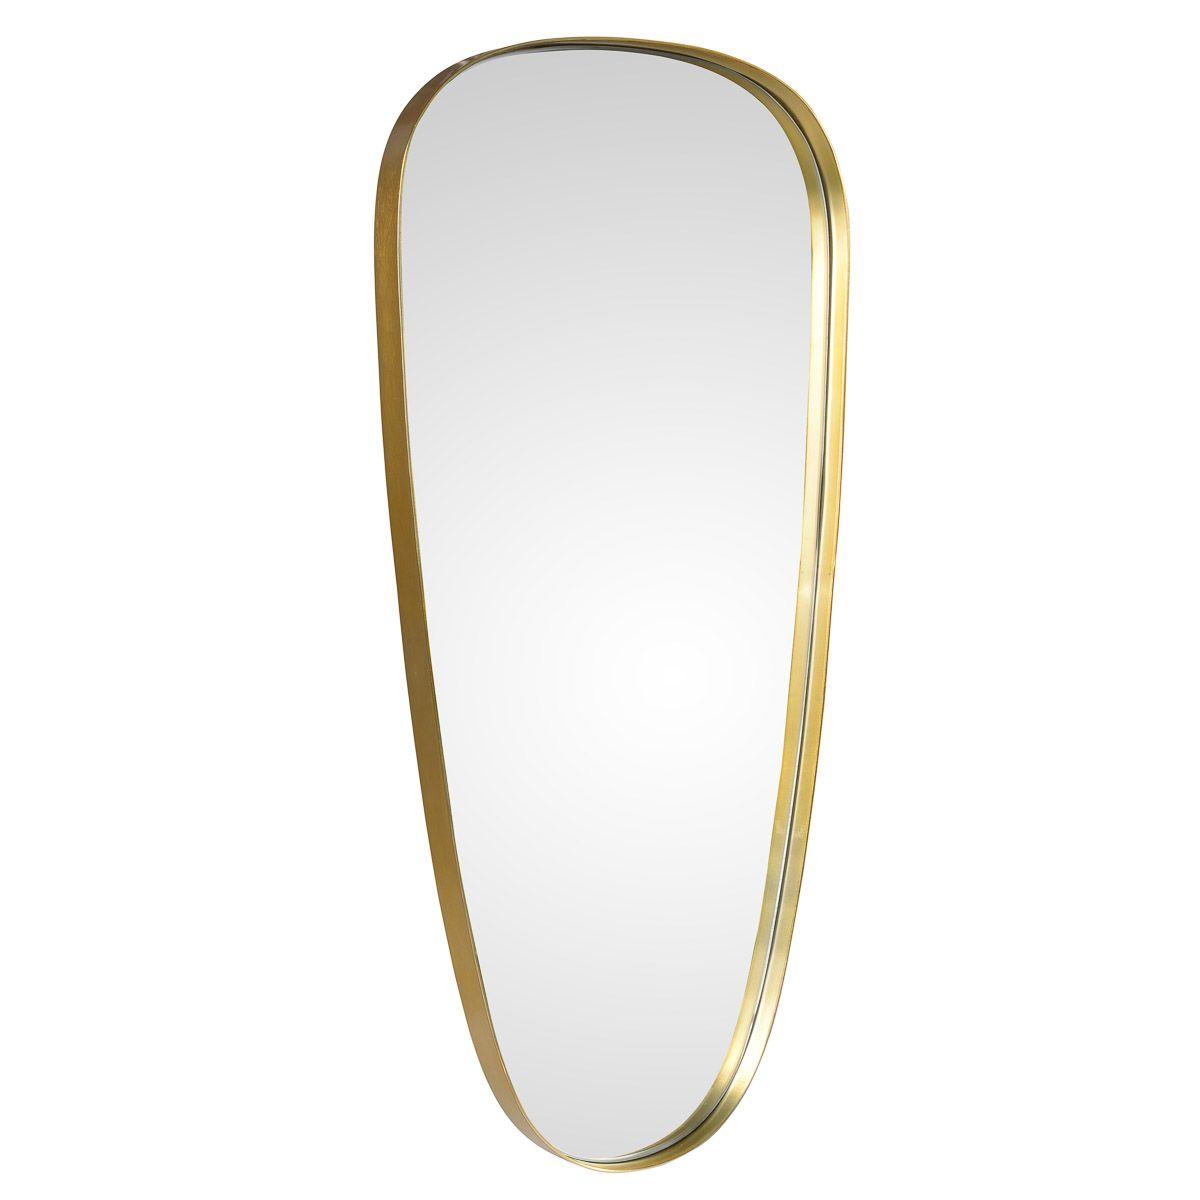 Miroir style indus' finition laiton DALY